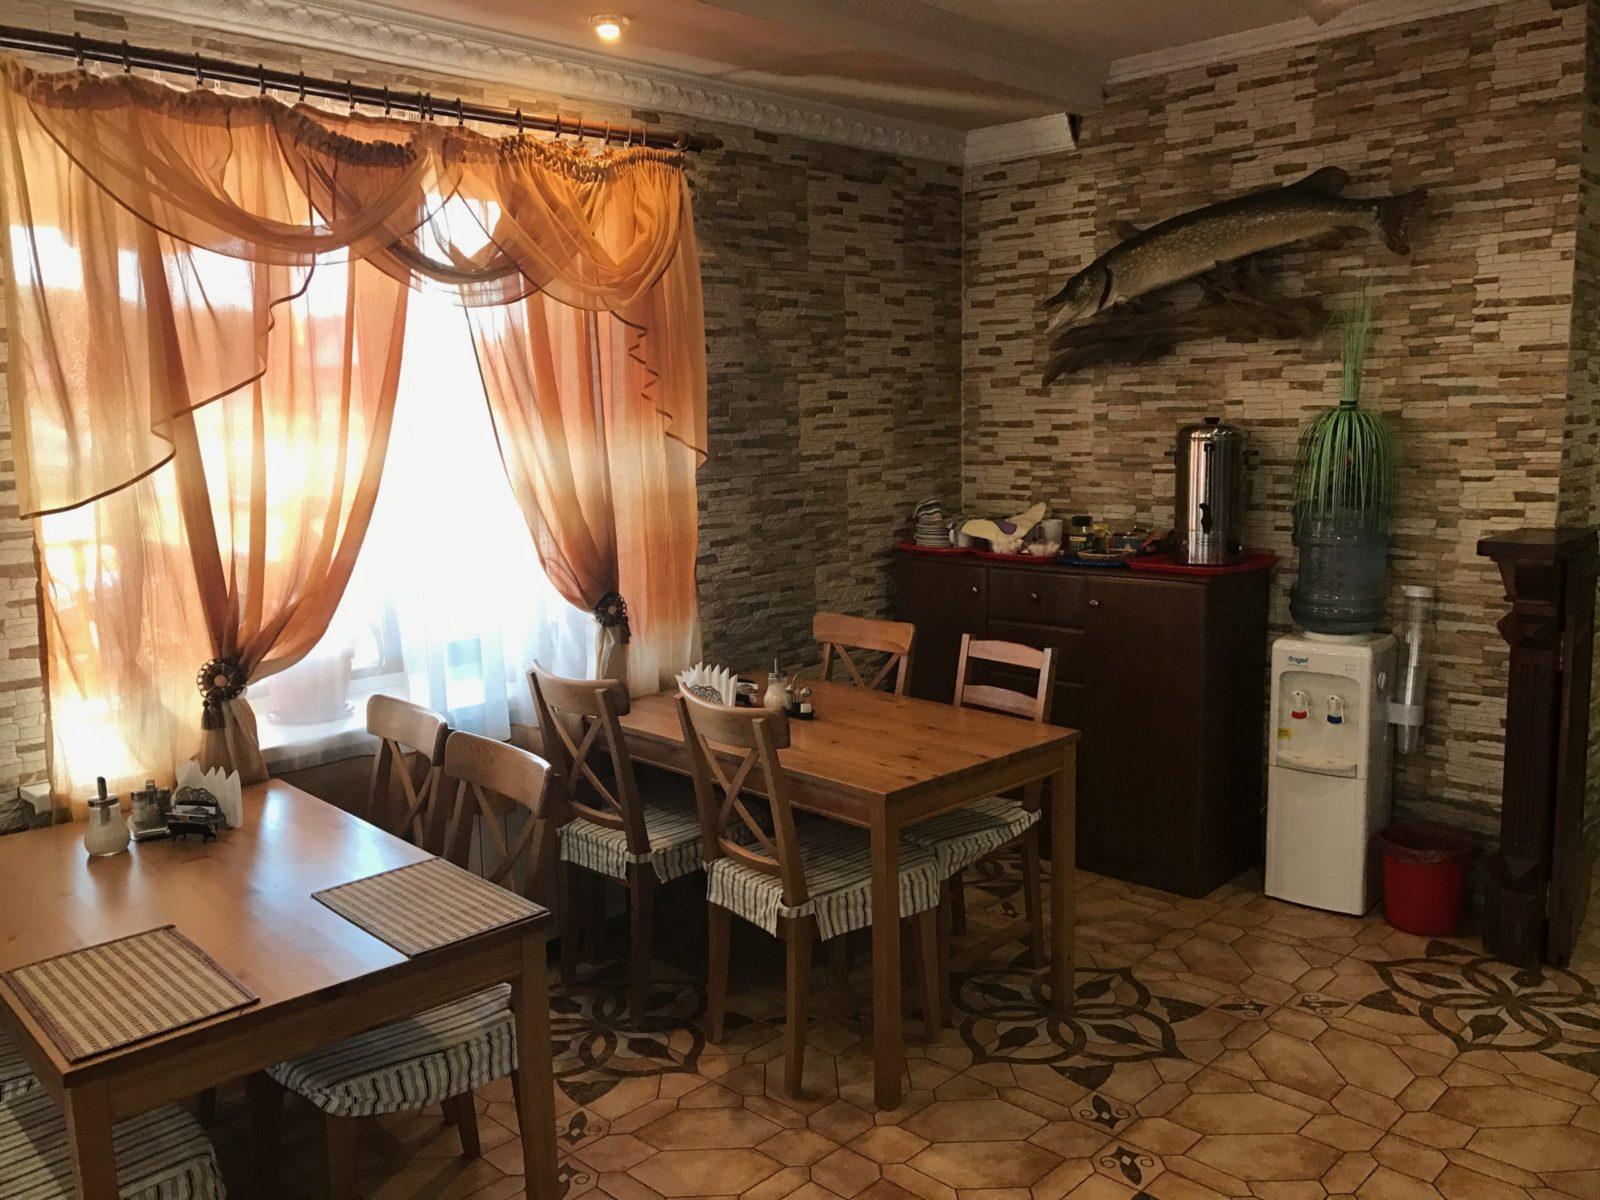 nashe kafe 2 rybolovnaja baza cherkasovo rybinskoe vodohranilishhe scaled - Наше кафе столики у окна